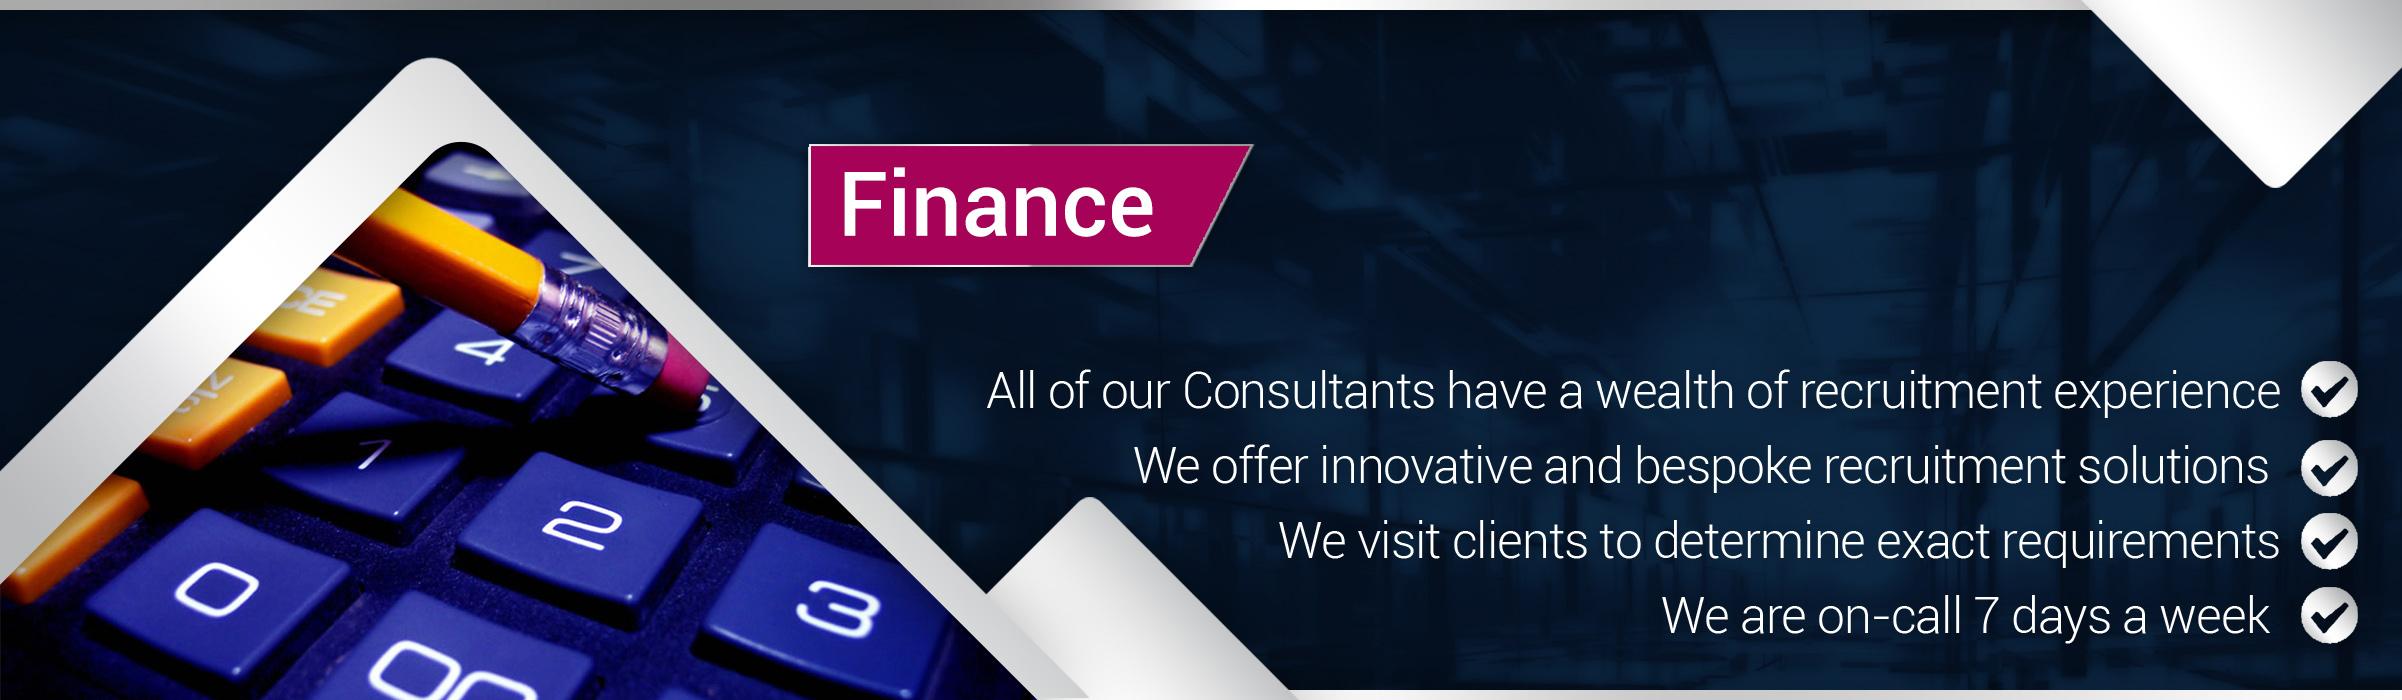 finance-1024x298